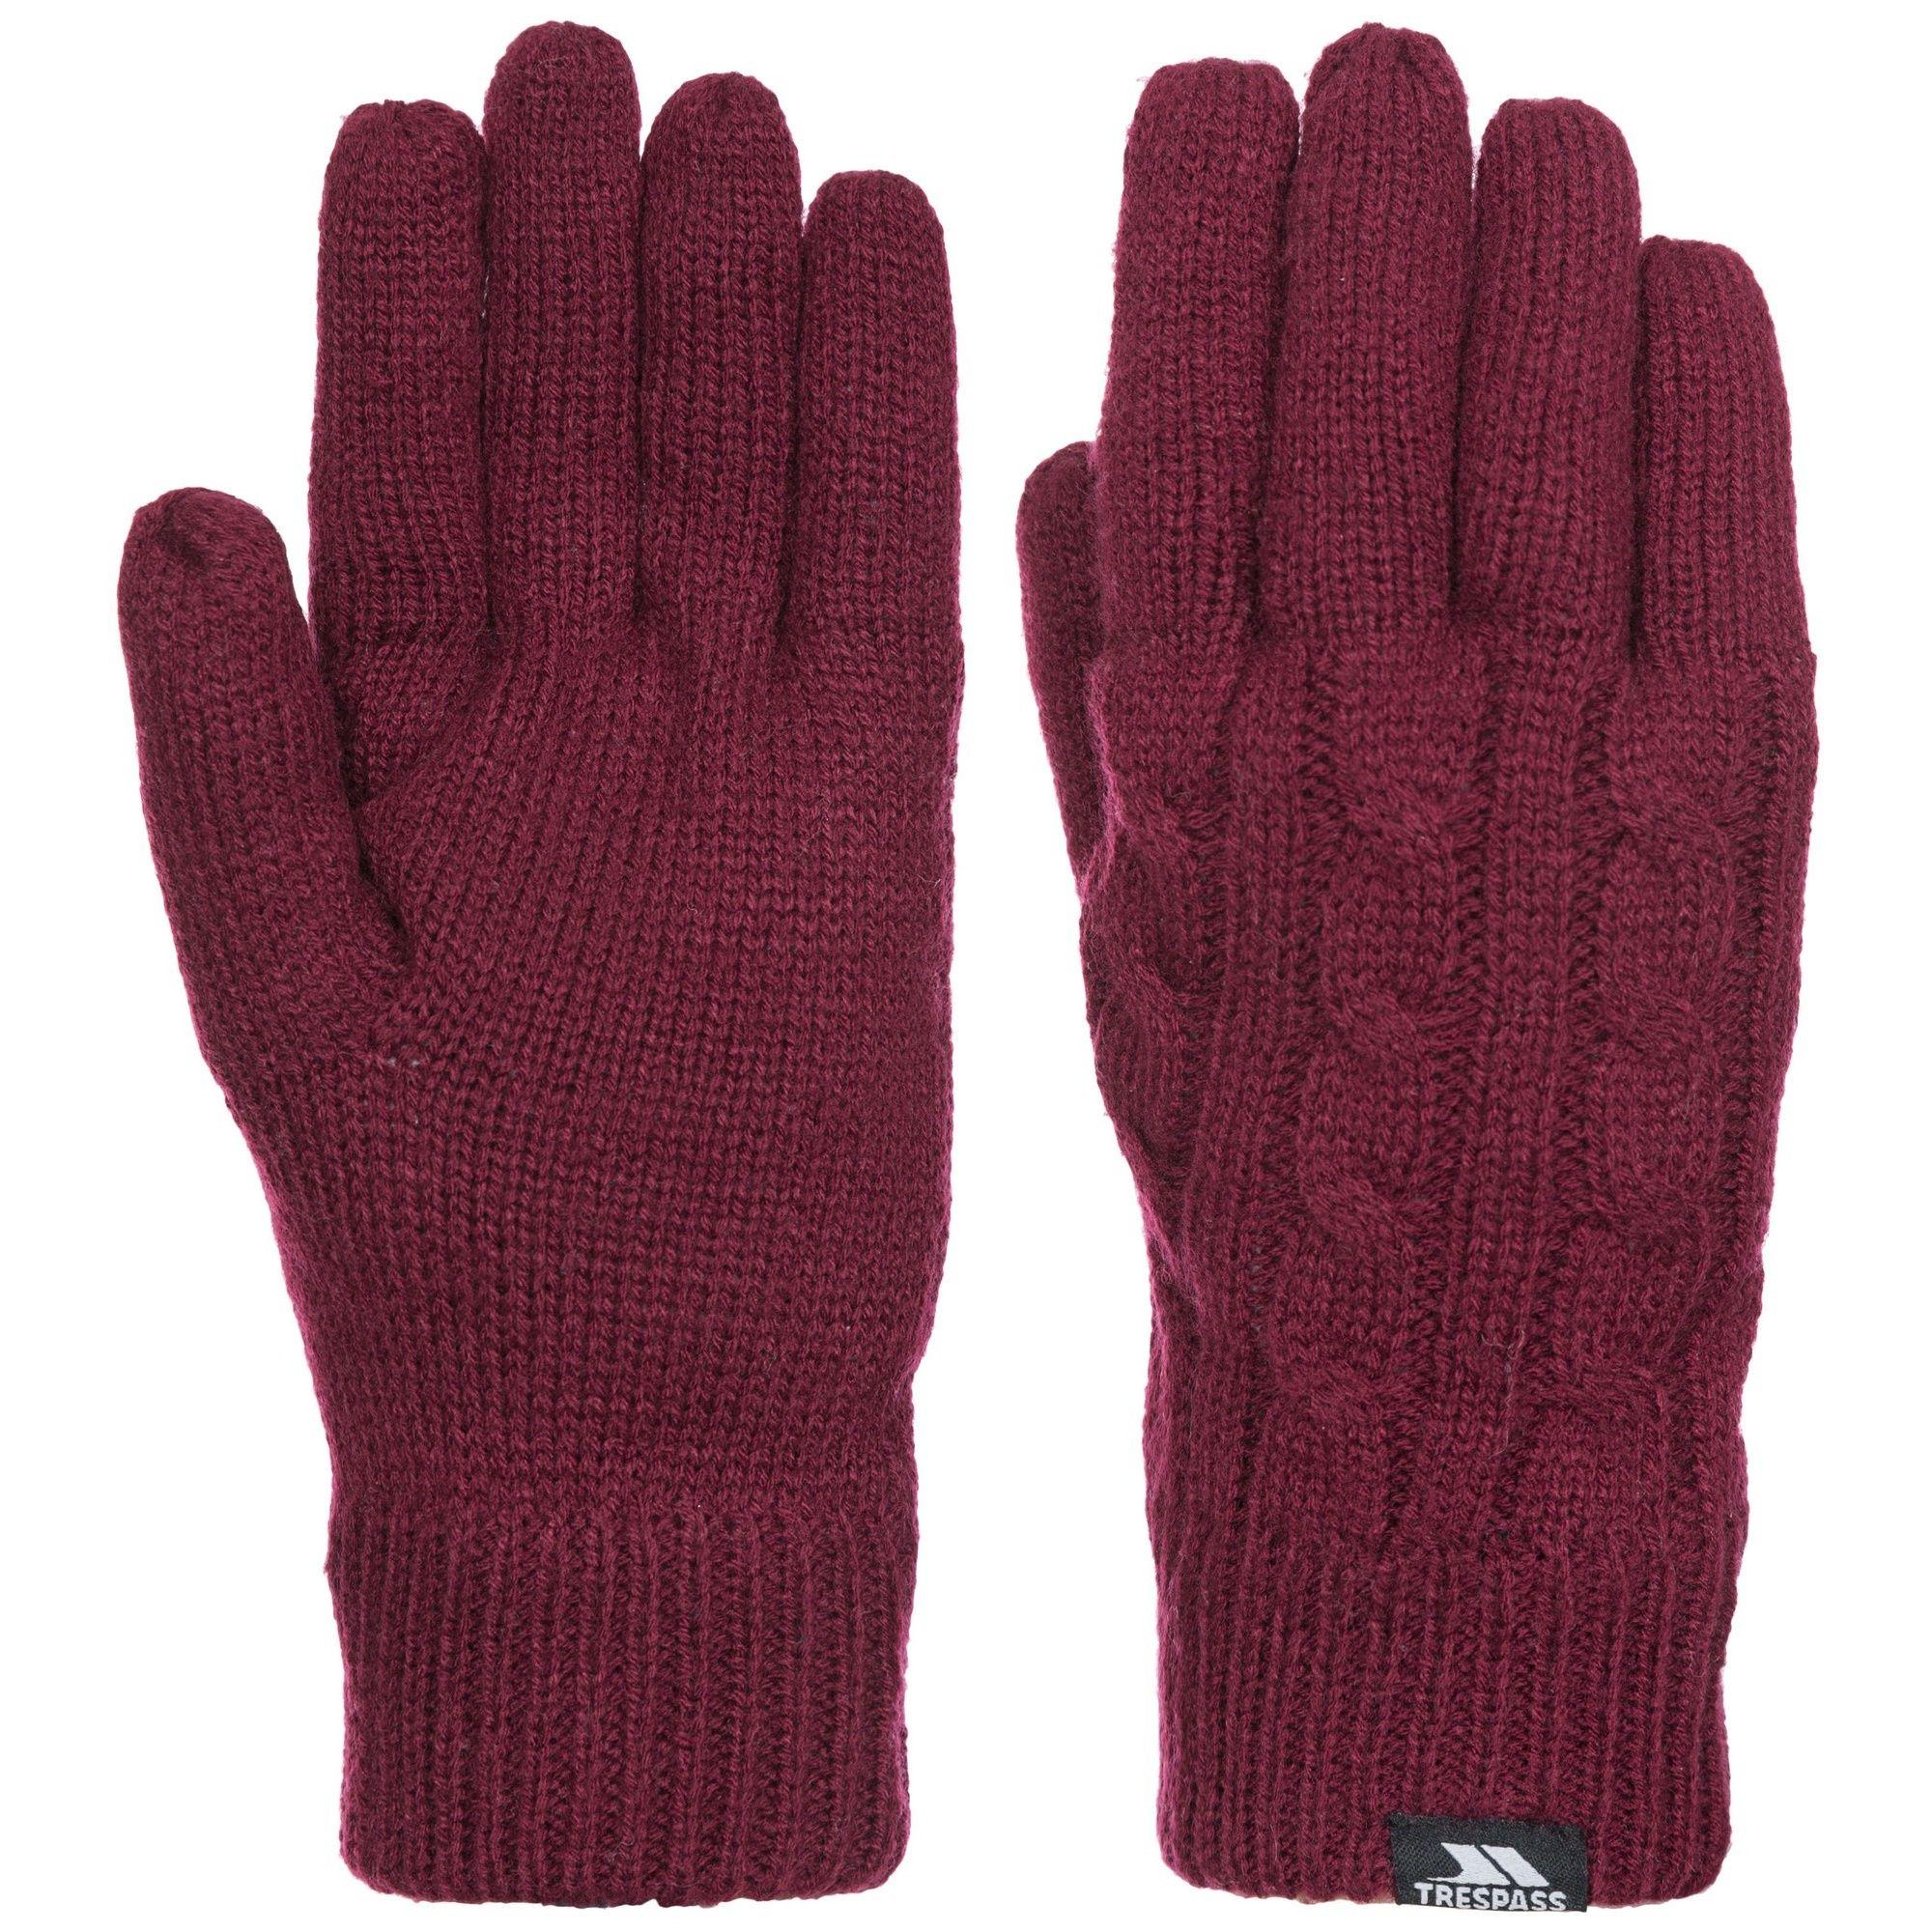 Trespass Womens/Ladies Sutella Knitted Gloves